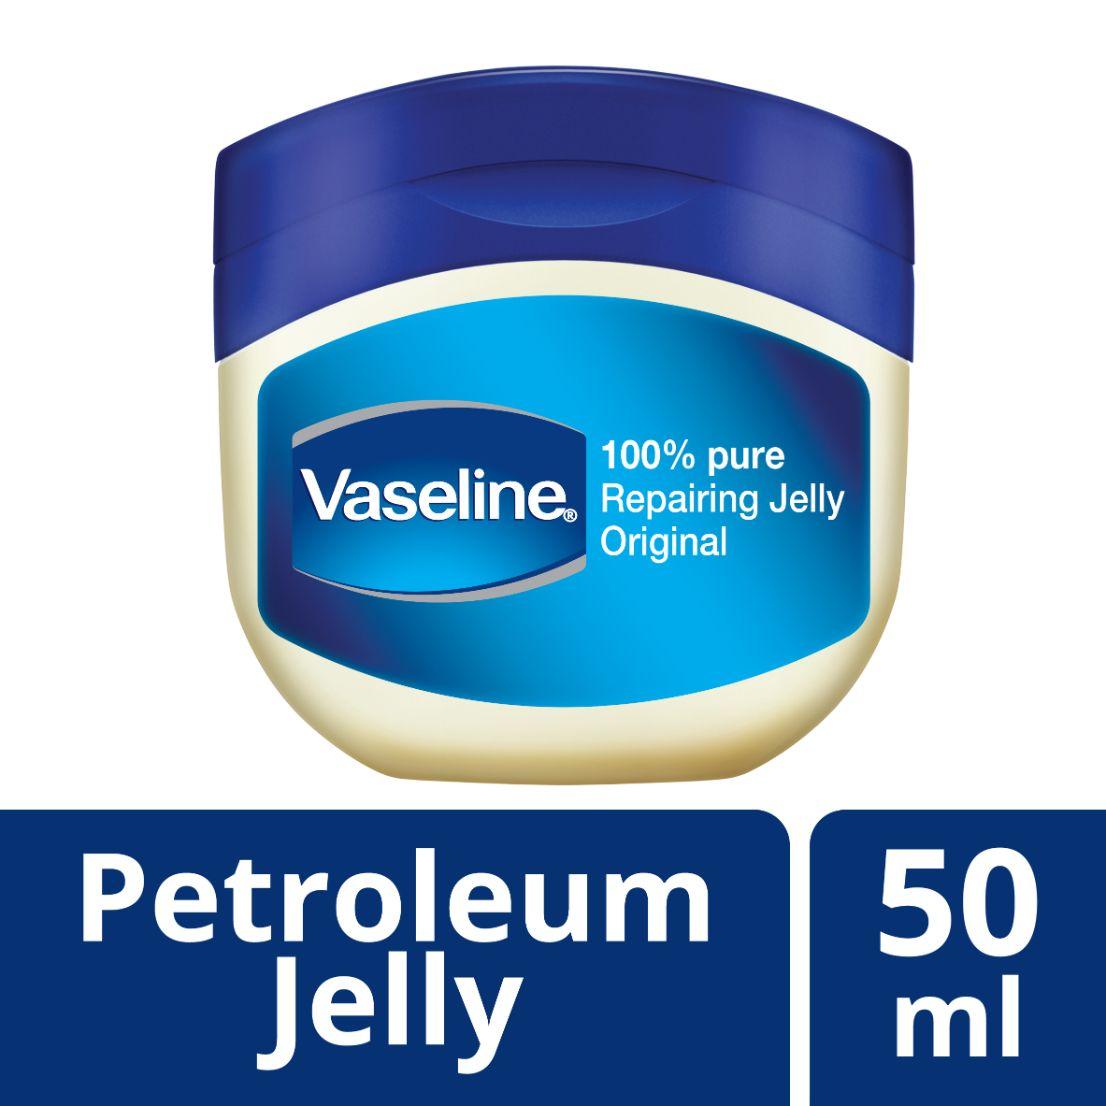 Vaseline Petroleum Jelly 50 mL